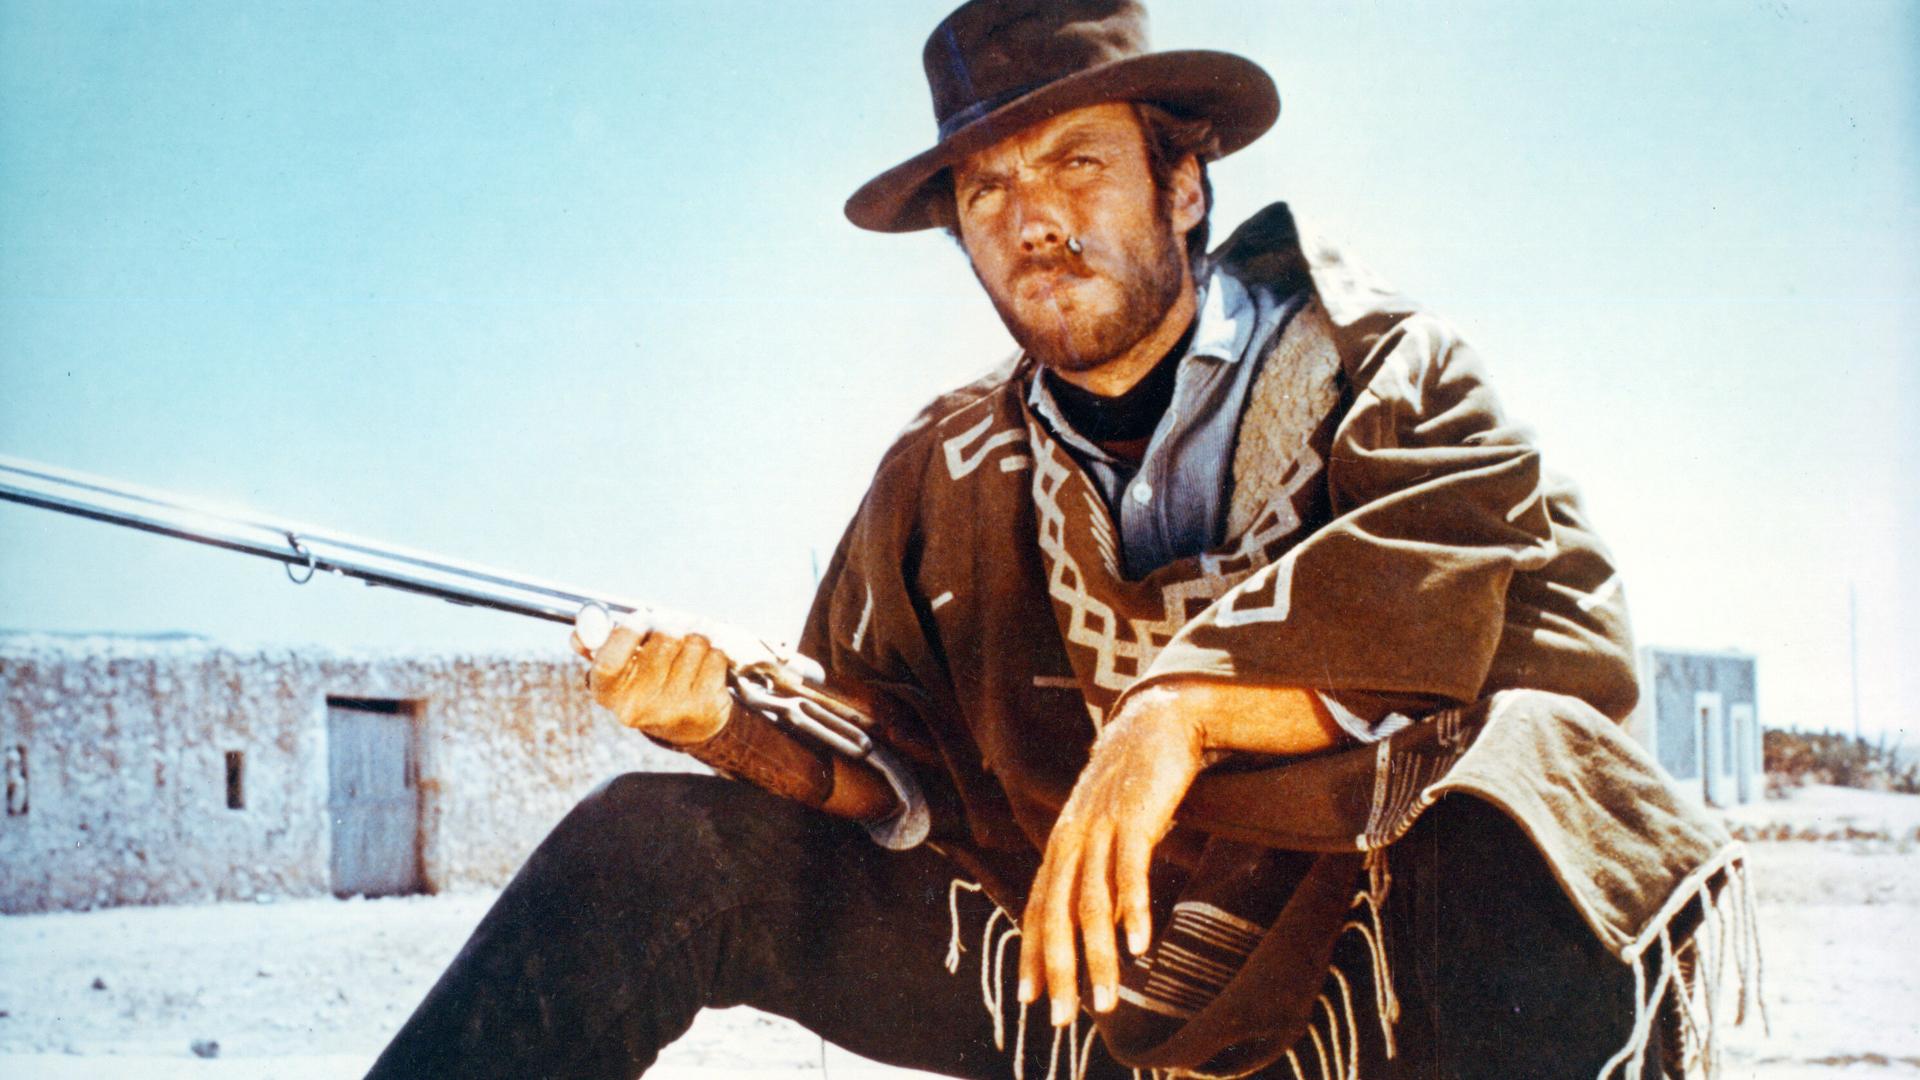 74 Clint Eastwood Wallpapers On Wallpapersafari